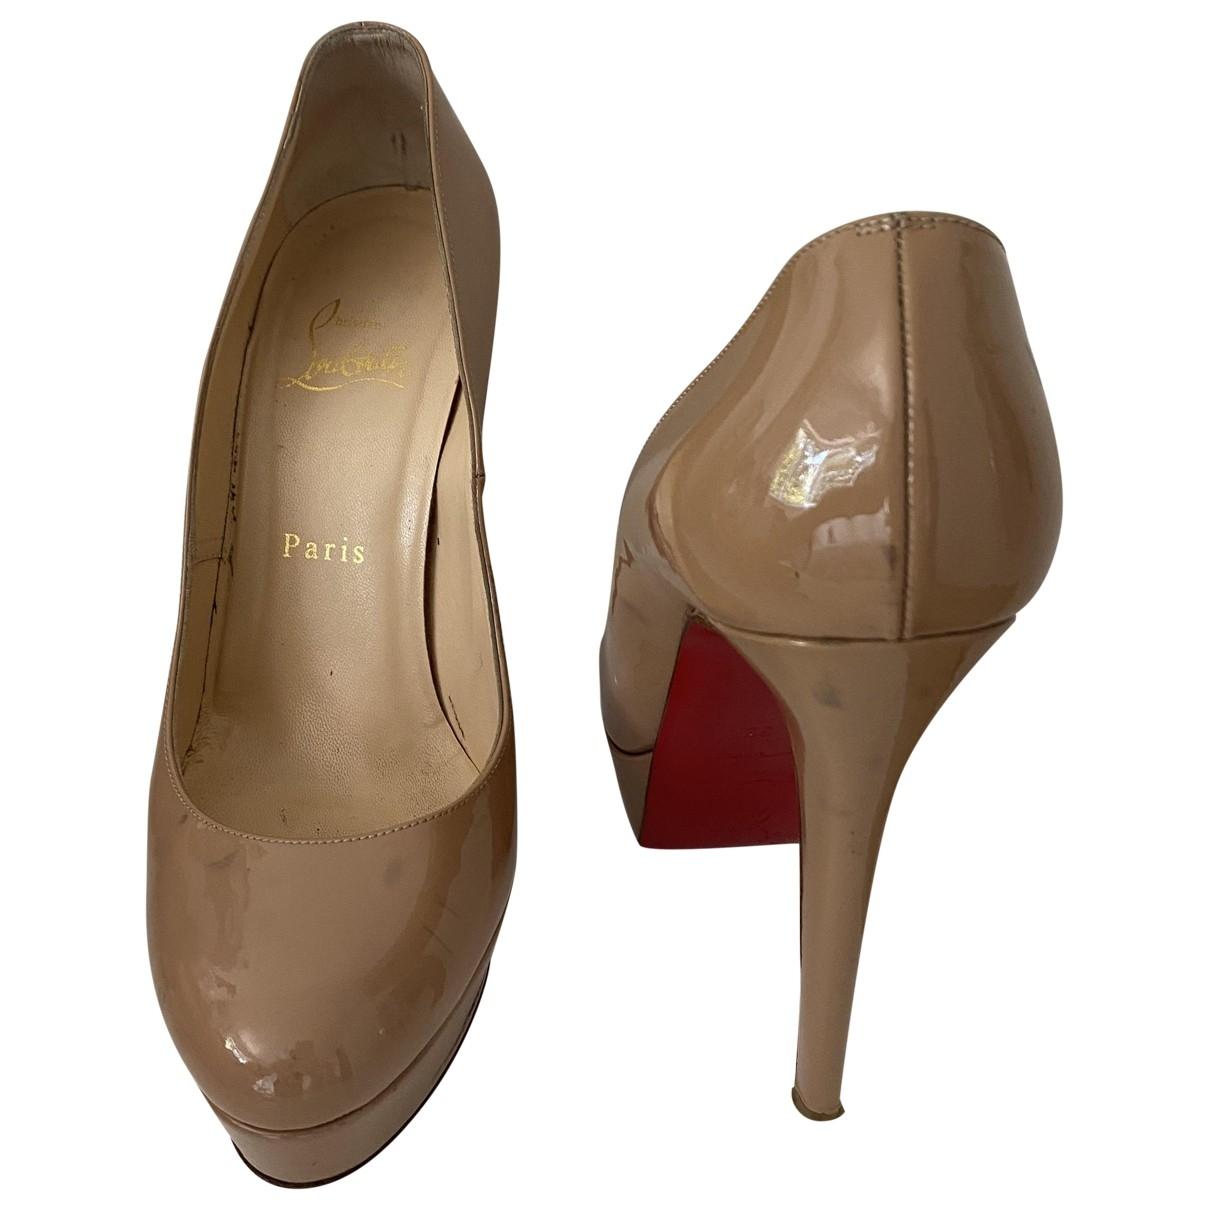 Christian Louboutin \N Beige Patent leather Heels for Women 38 EU